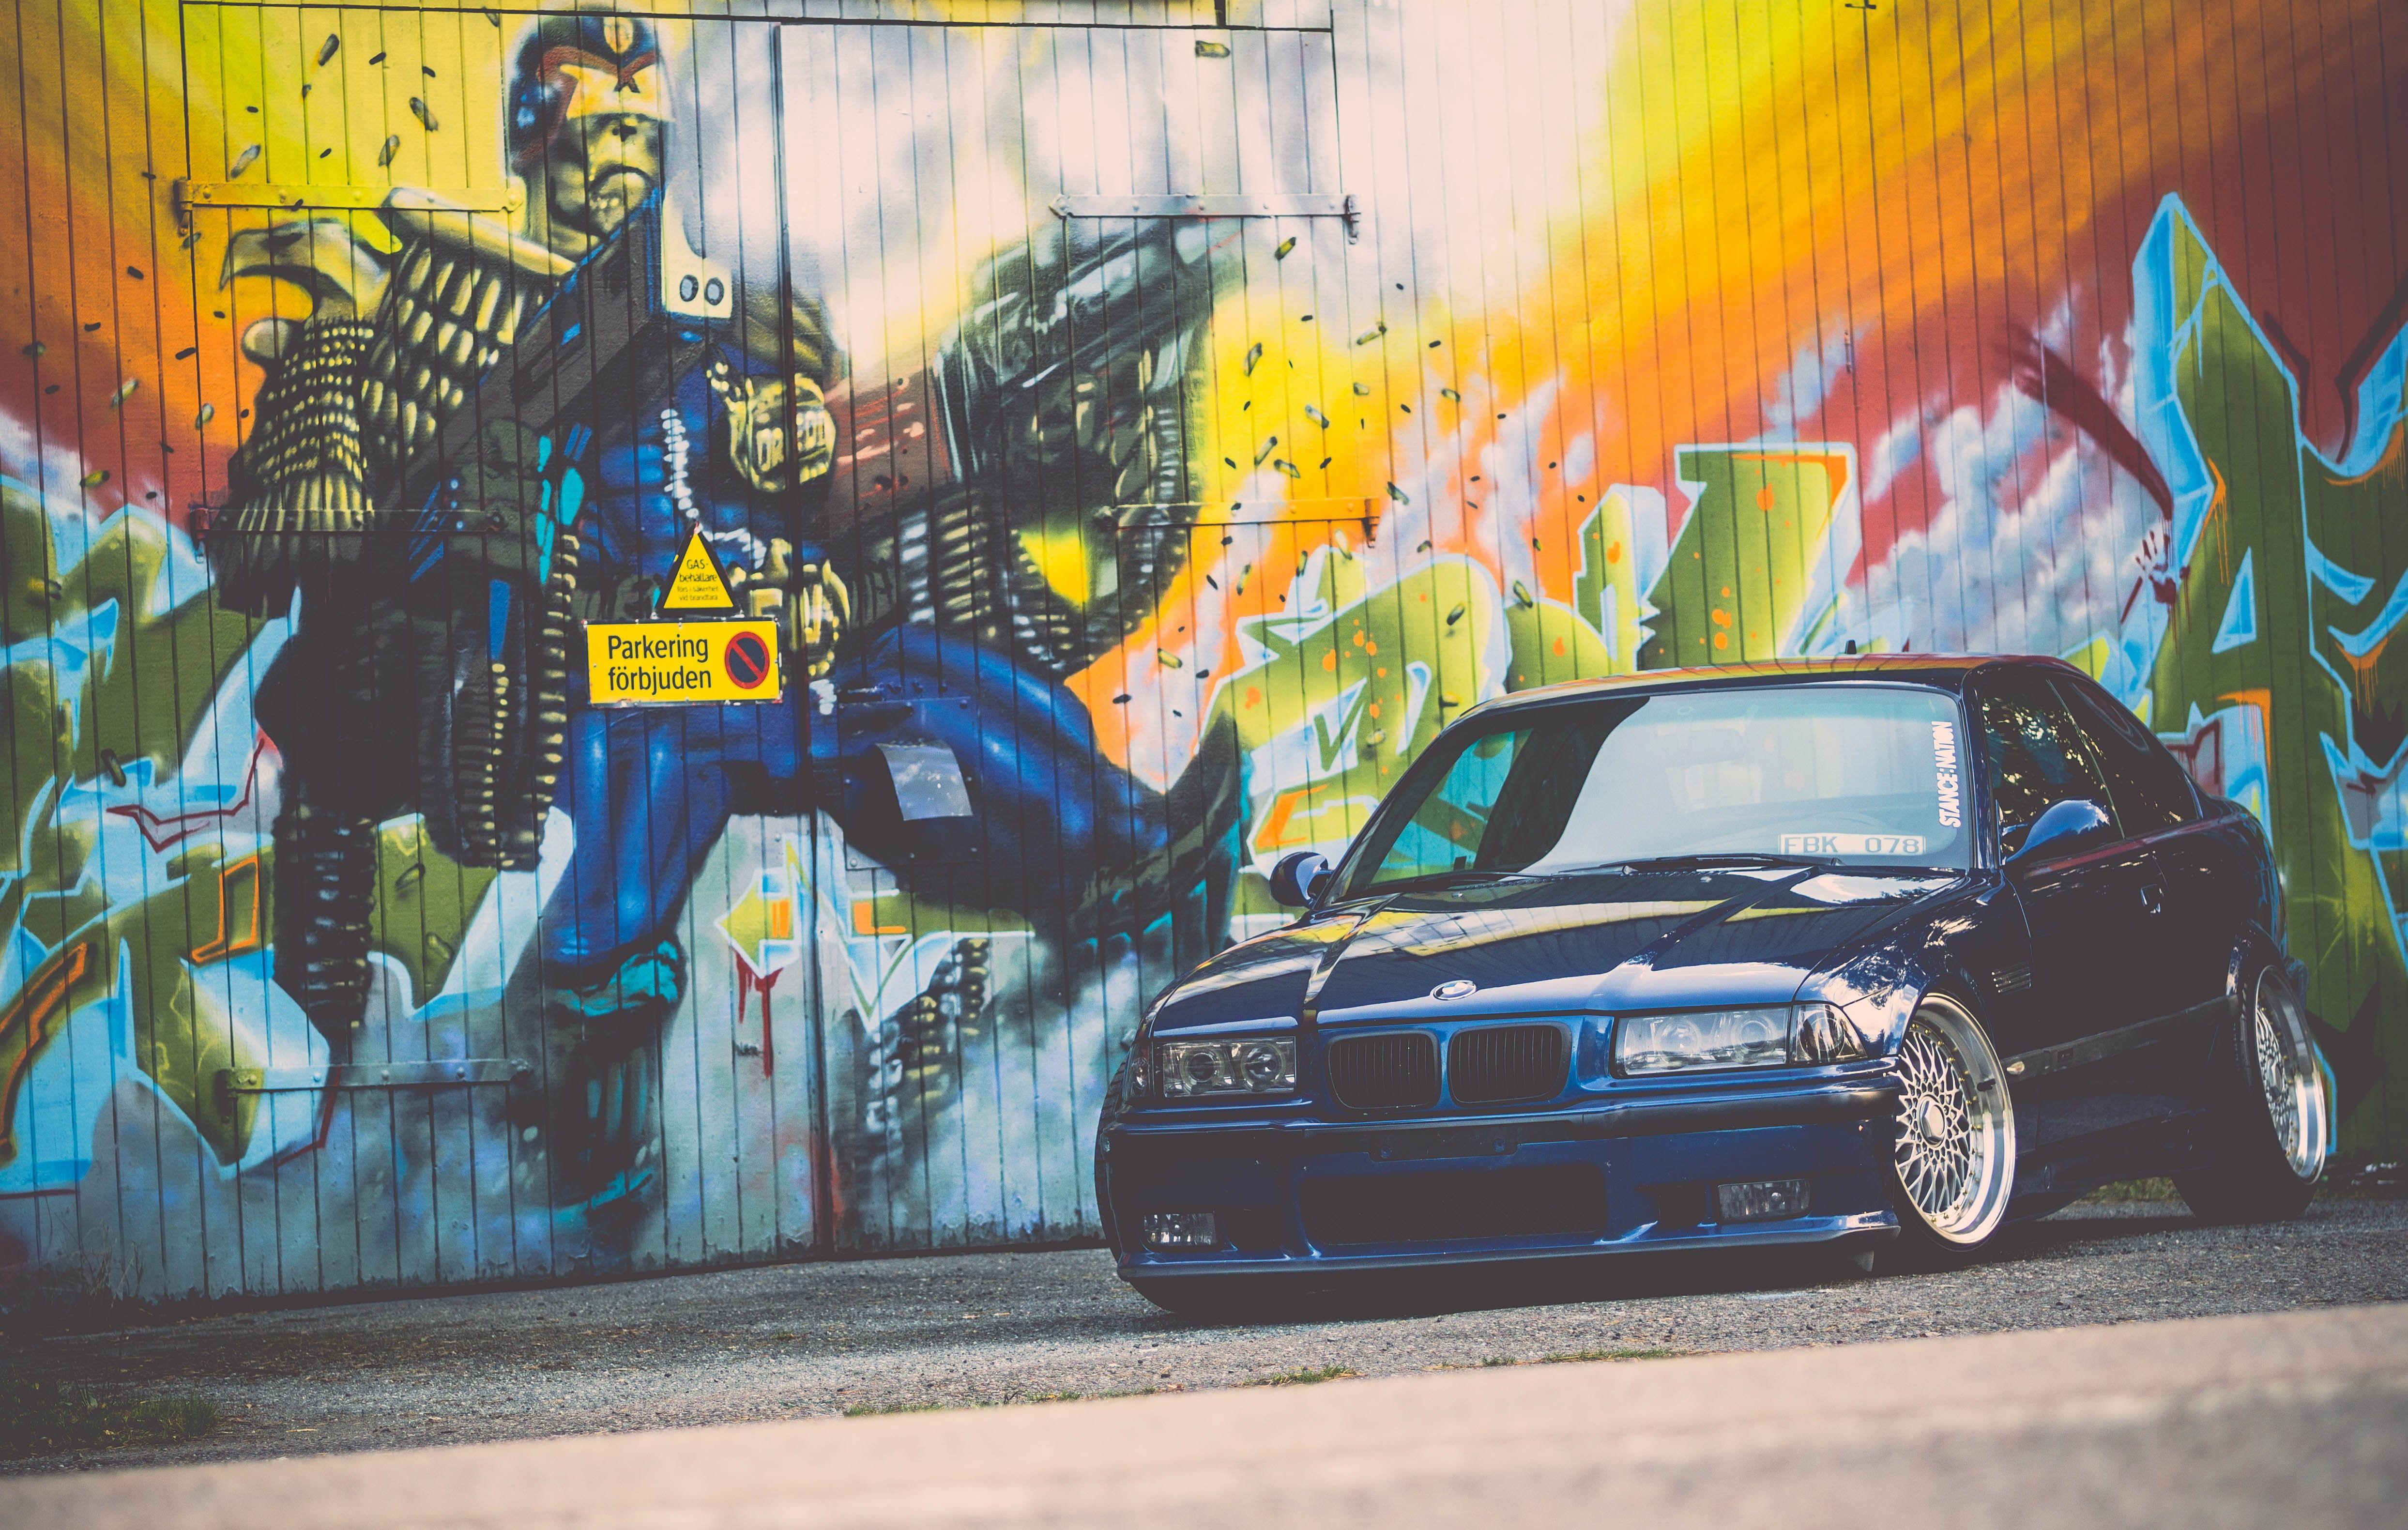 Bmw E36 Tuning E36 M3 Bmw Tuning Stance Blue Graffiti 4k Wallpaper Hdwallpaper Desktop Action Wallpaper Graffiti Wallpaper Graffiti